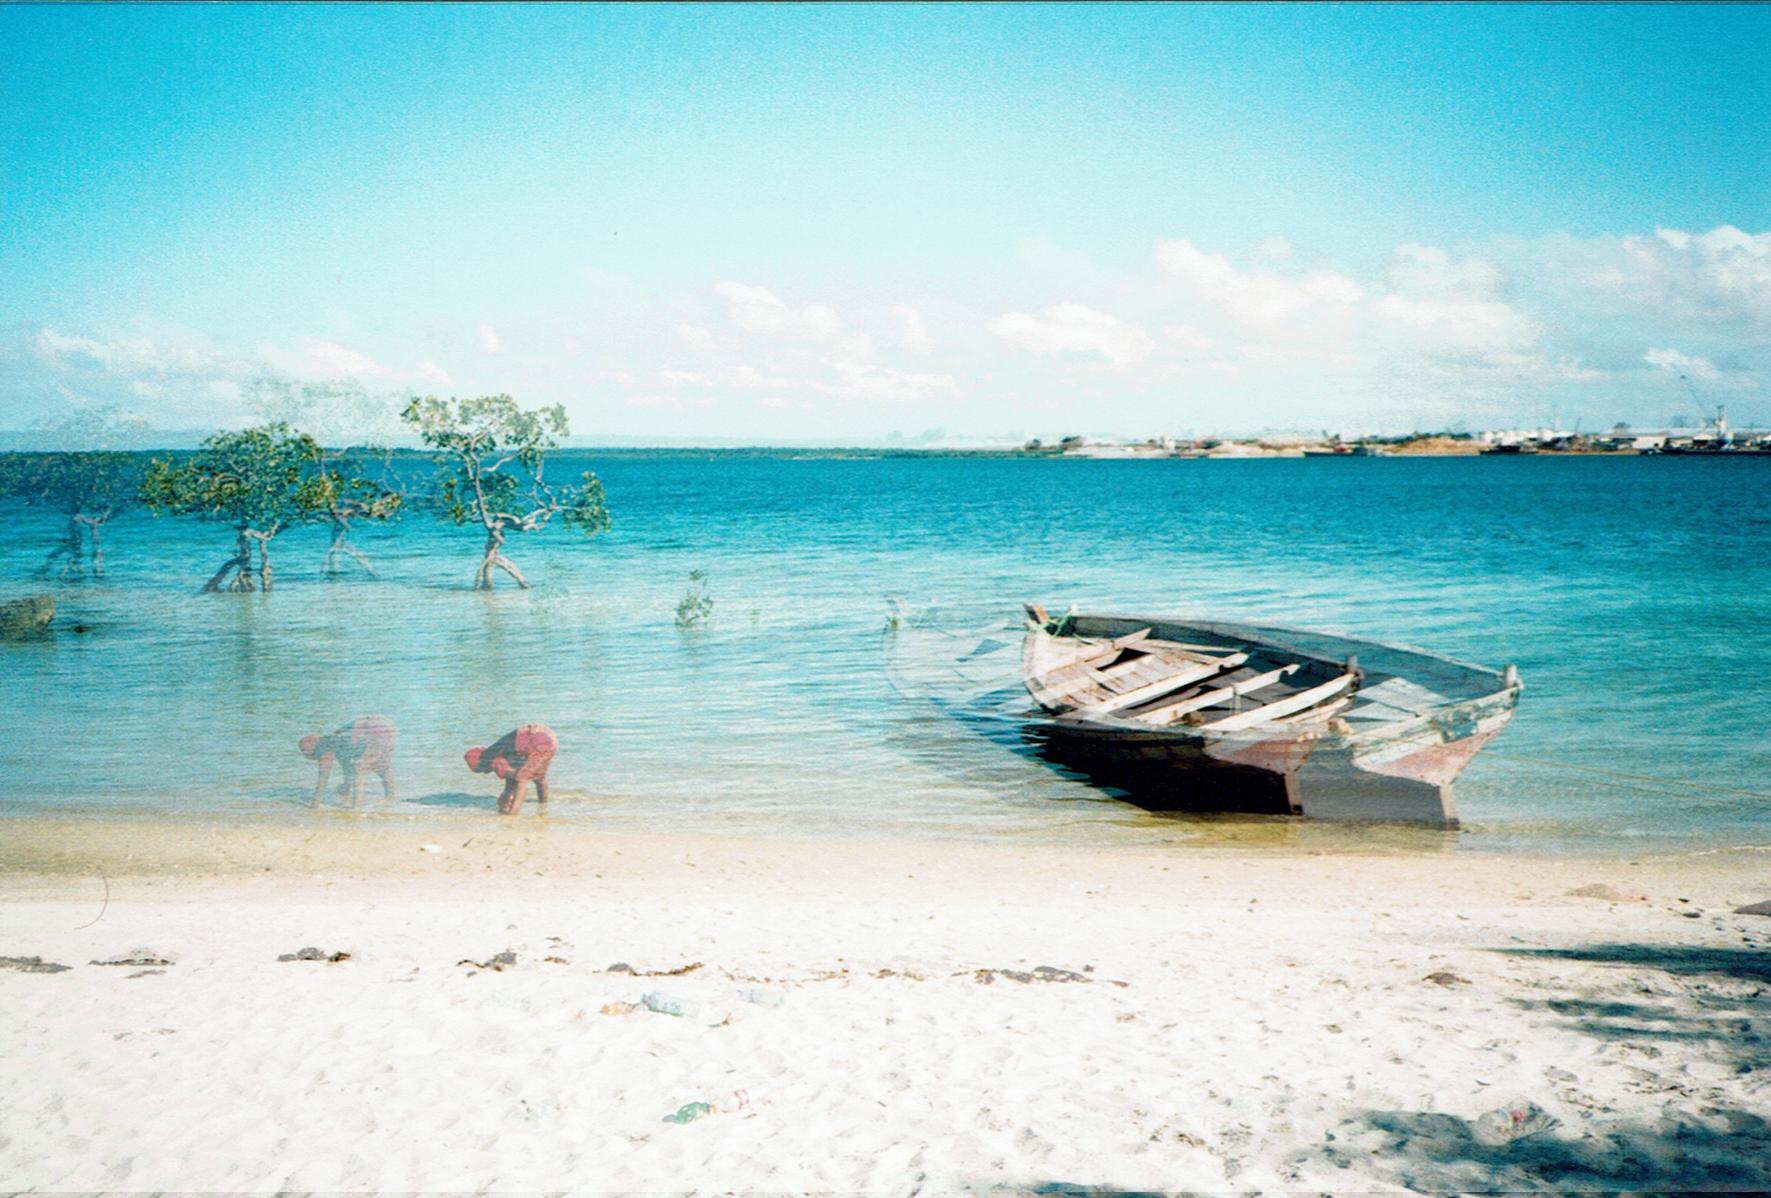 Tanzania Fisherwomen